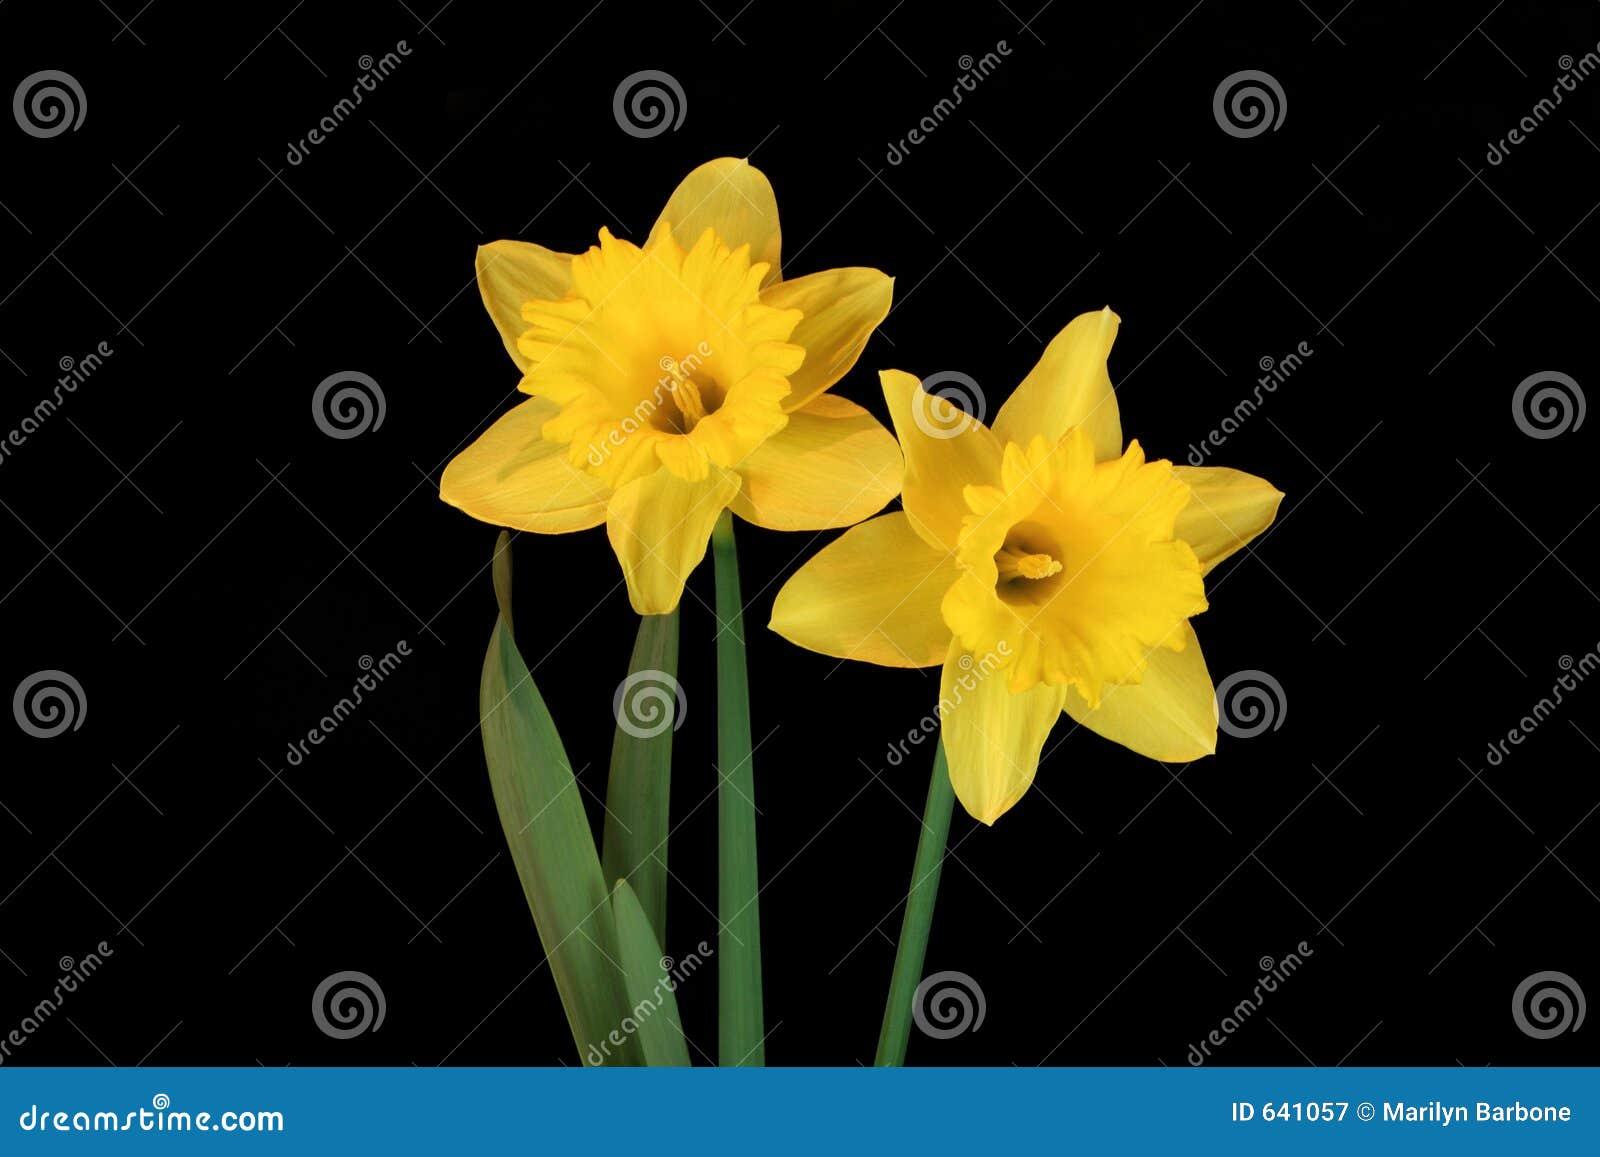 Daffodil Beauties